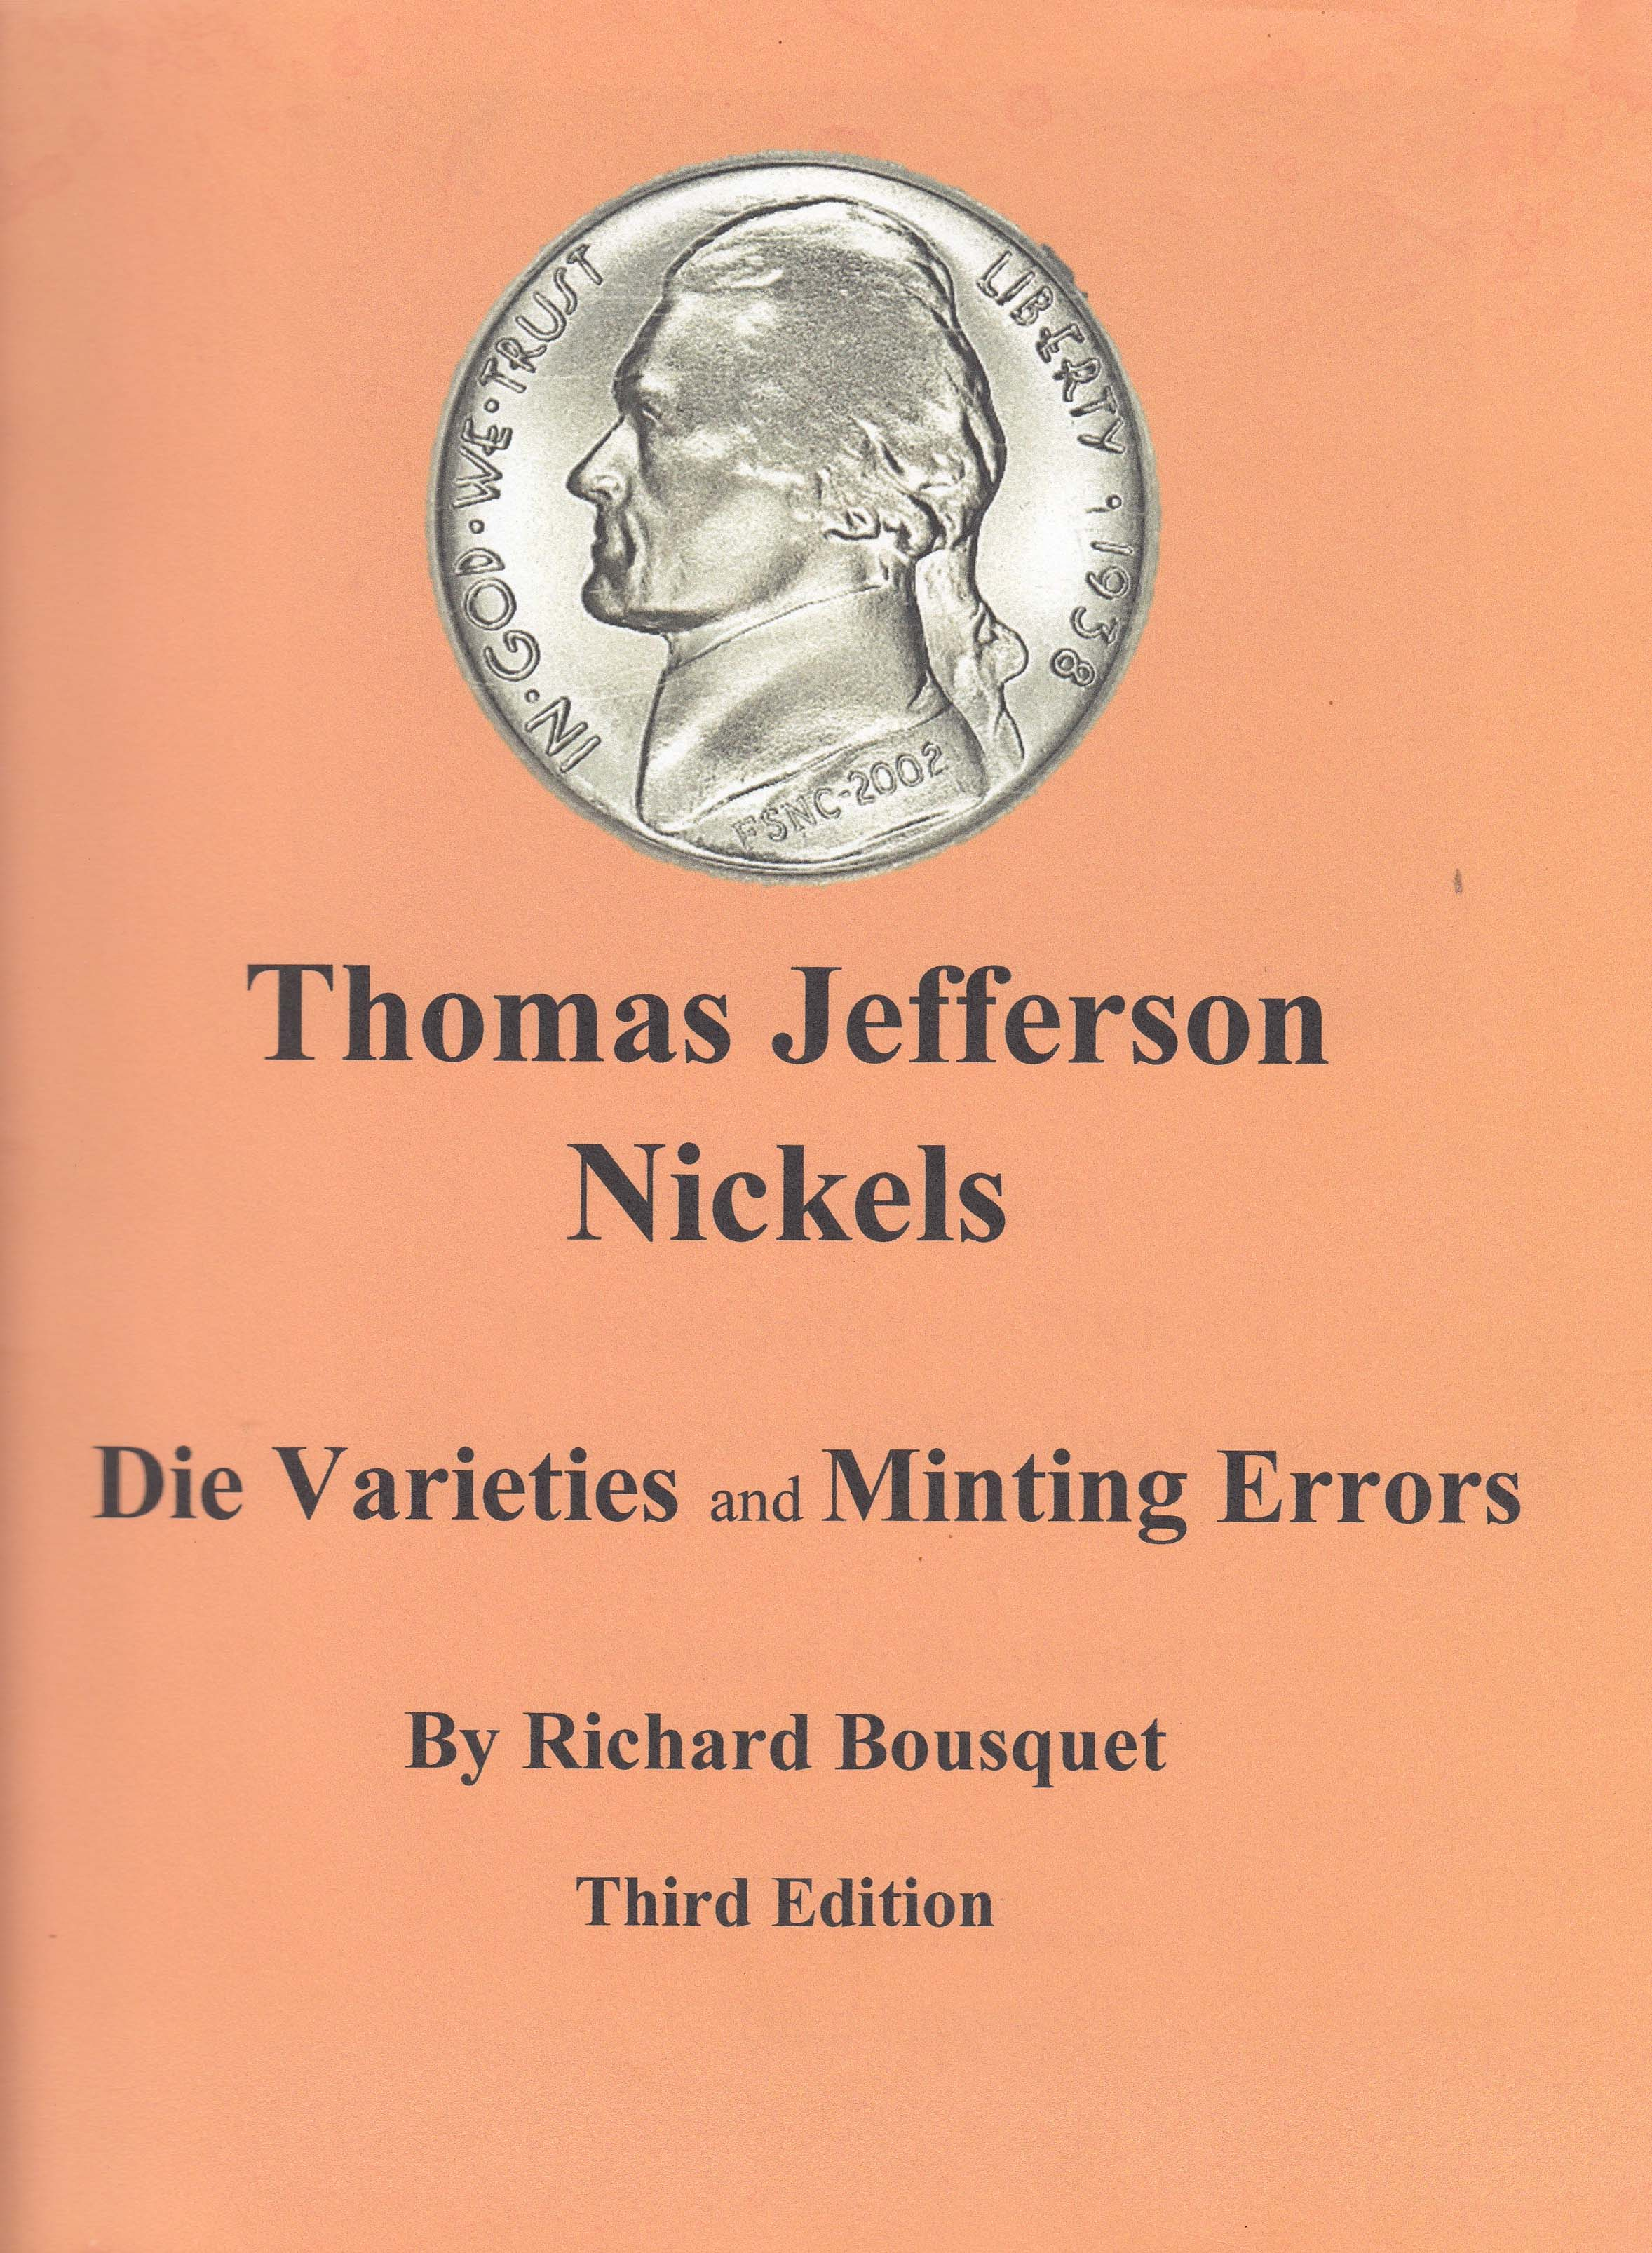 Photographs of Thomas Jefferson Nickels: Die Varieties and Minting